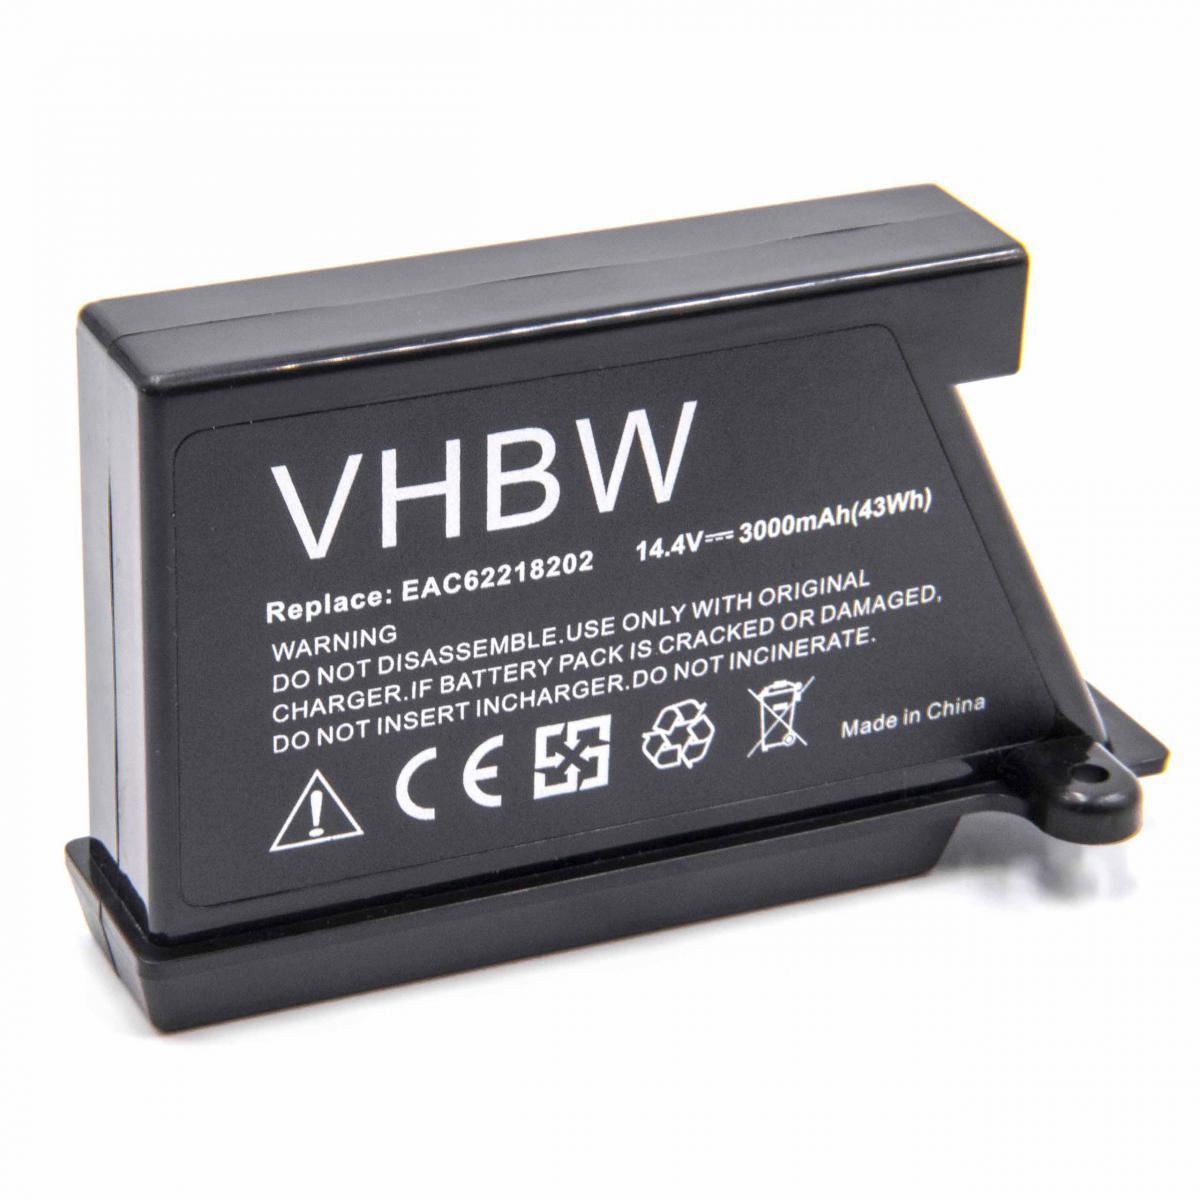 Vhbw vhbw Batterie compatible avec LG HOM-BOT VR65710LVMP, VR65713LVM, VR65715LVM robot électroménager (3000mAh, 14,4V, Li-io